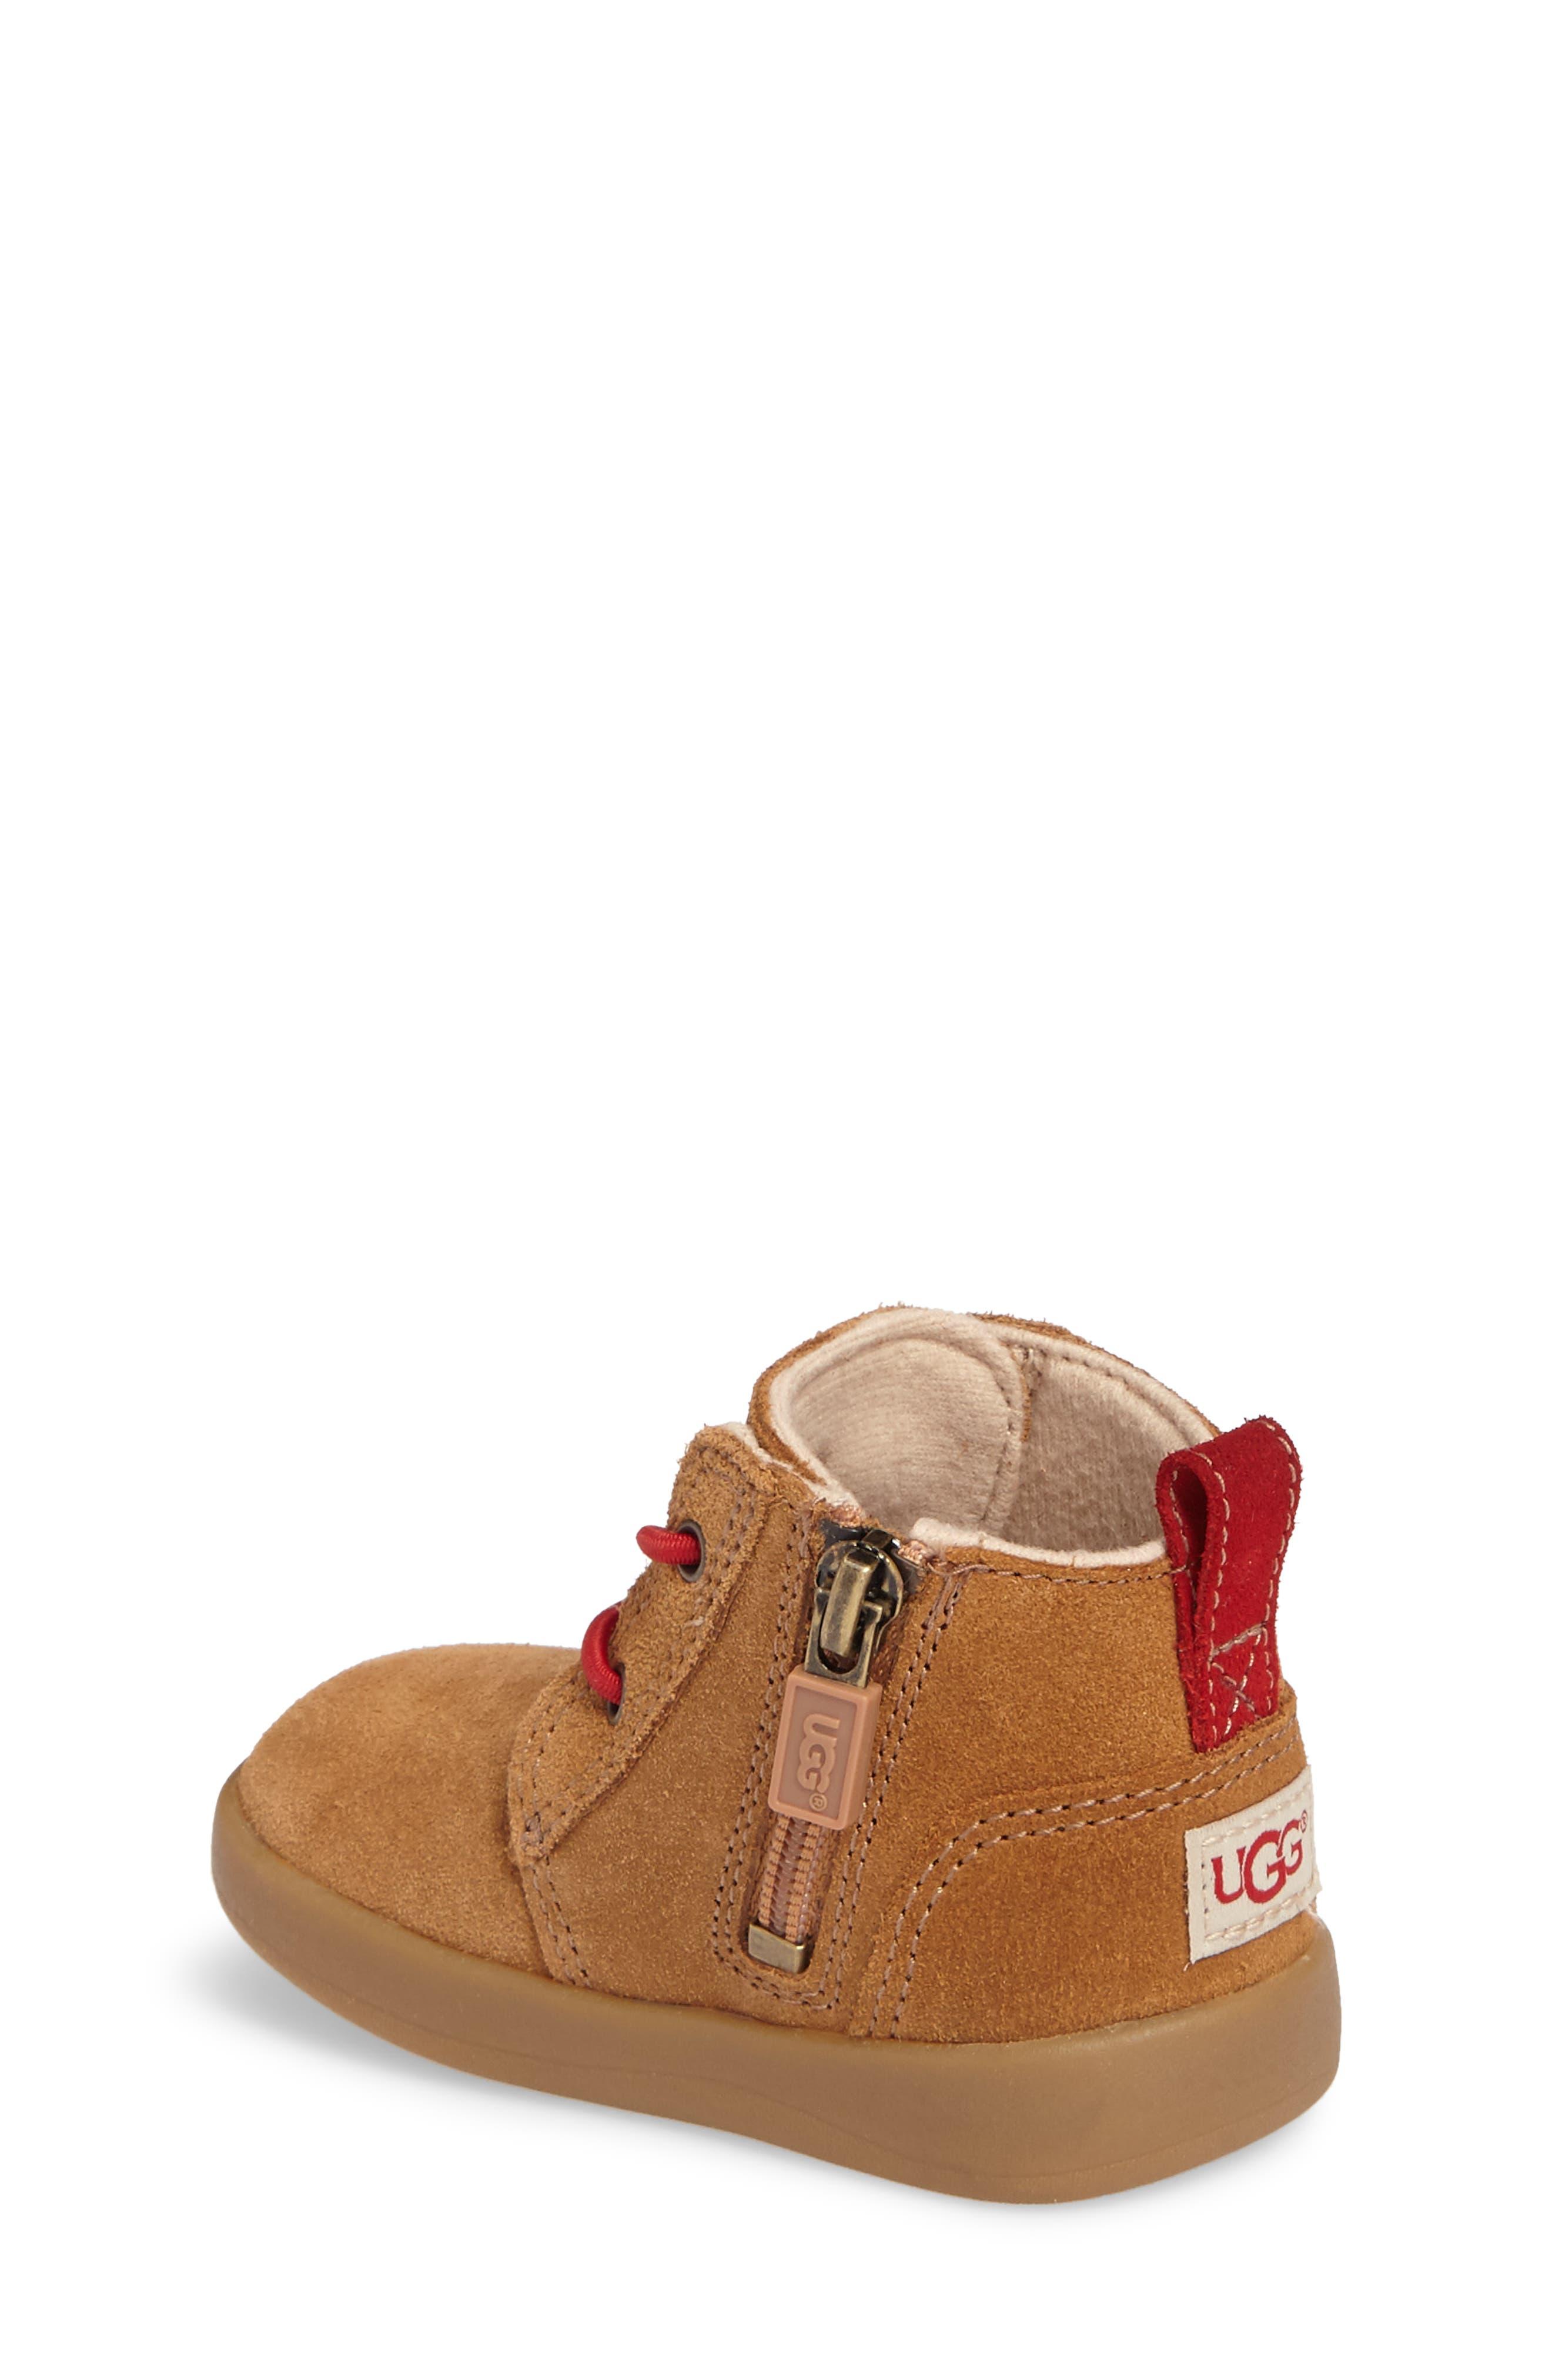 Alternate Image 2  - UGG® Kristjan Chukka Bootie Sneaker (Baby & Walker)